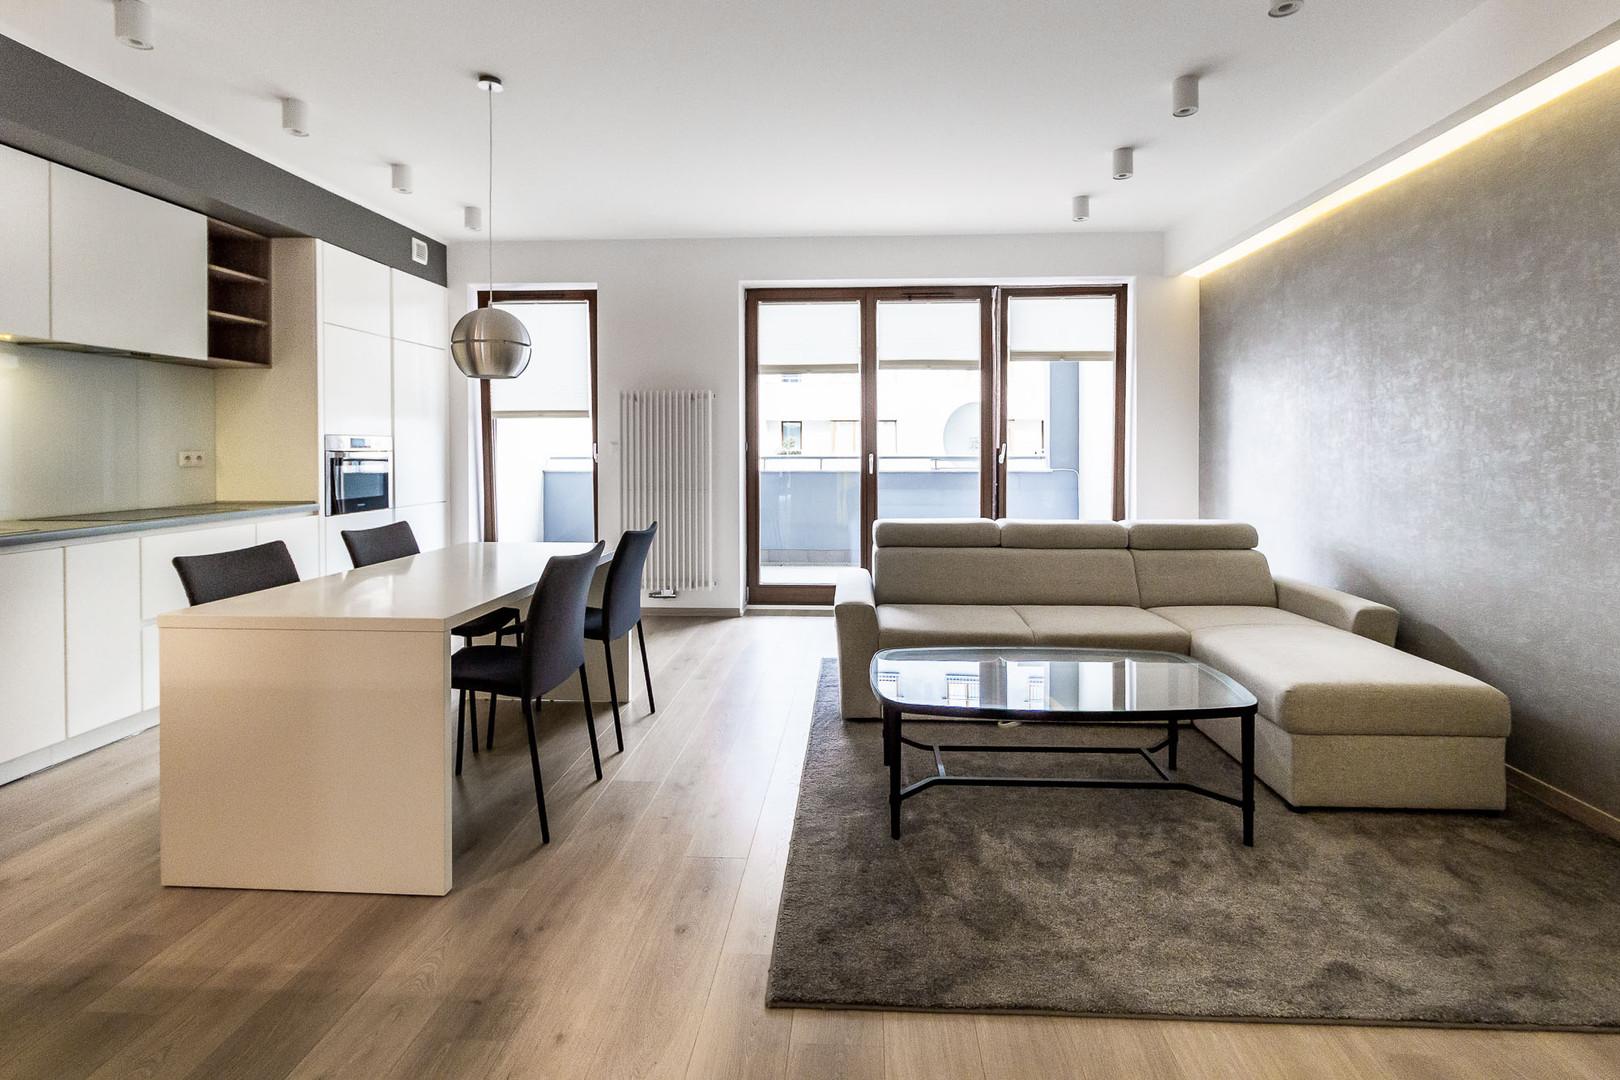 Property to rent Poznan Poland-5.jpg